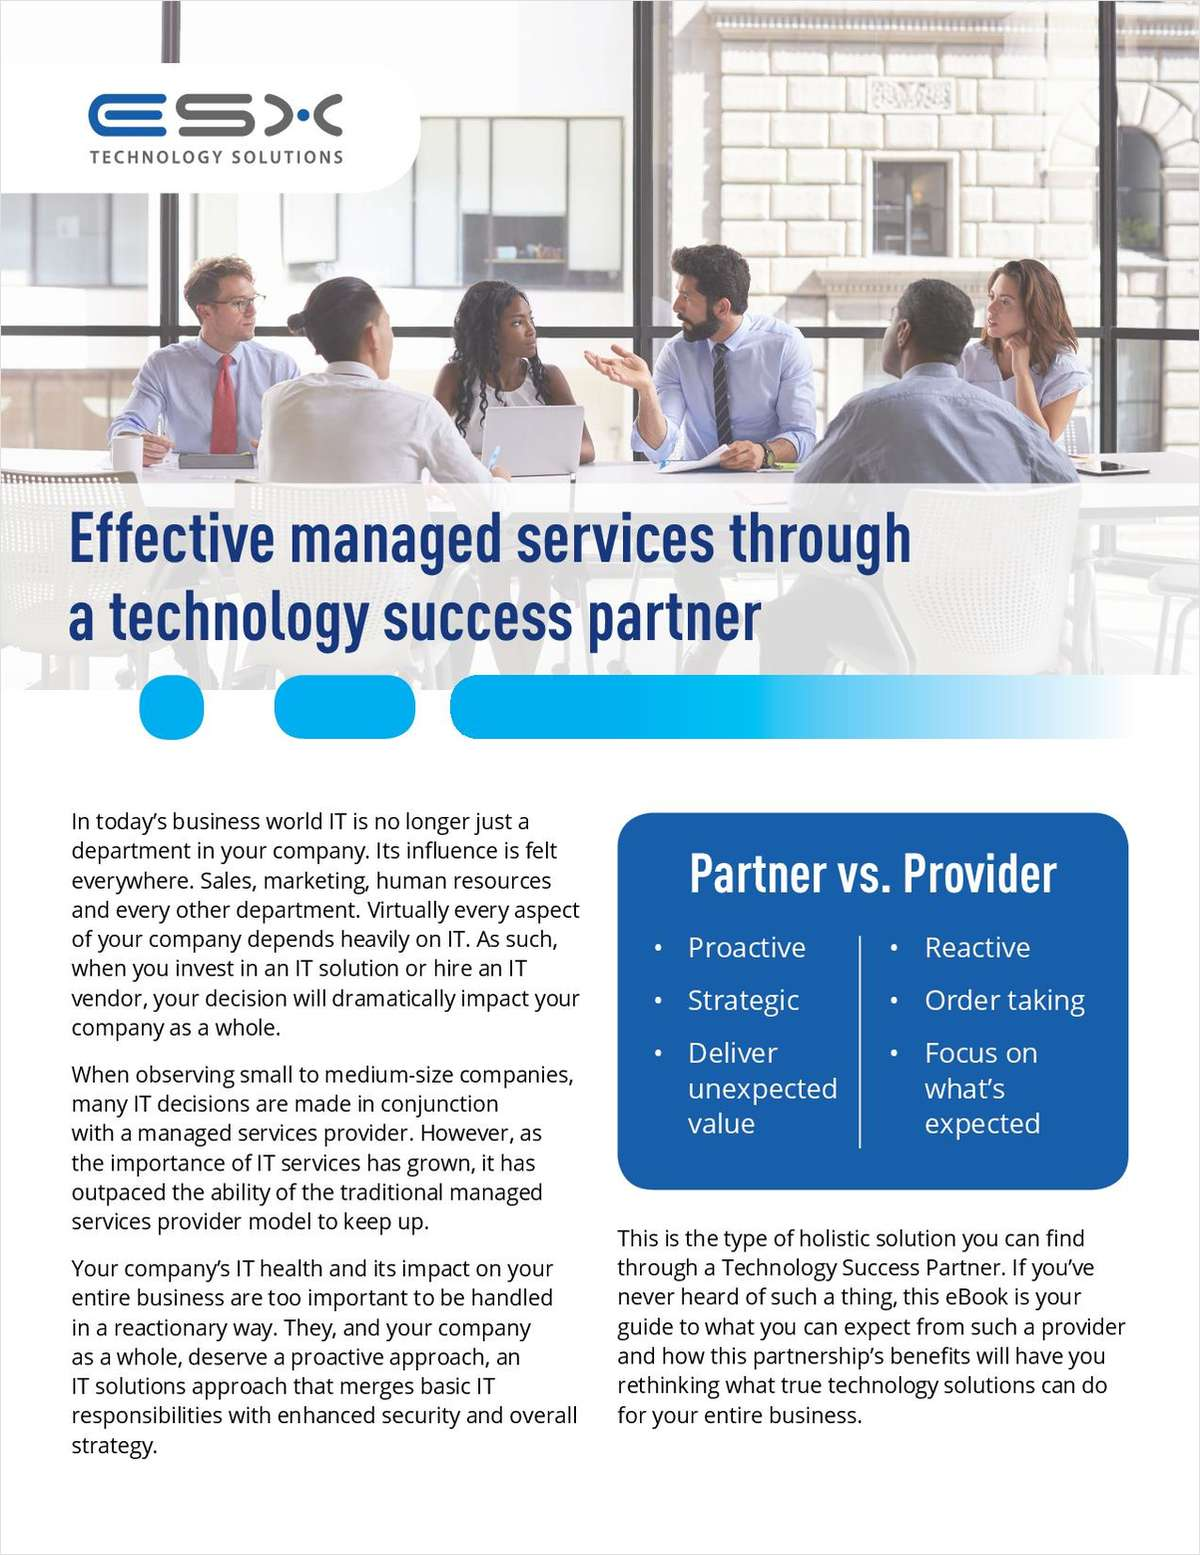 Effective Managed Services Through a Technology Success Partner